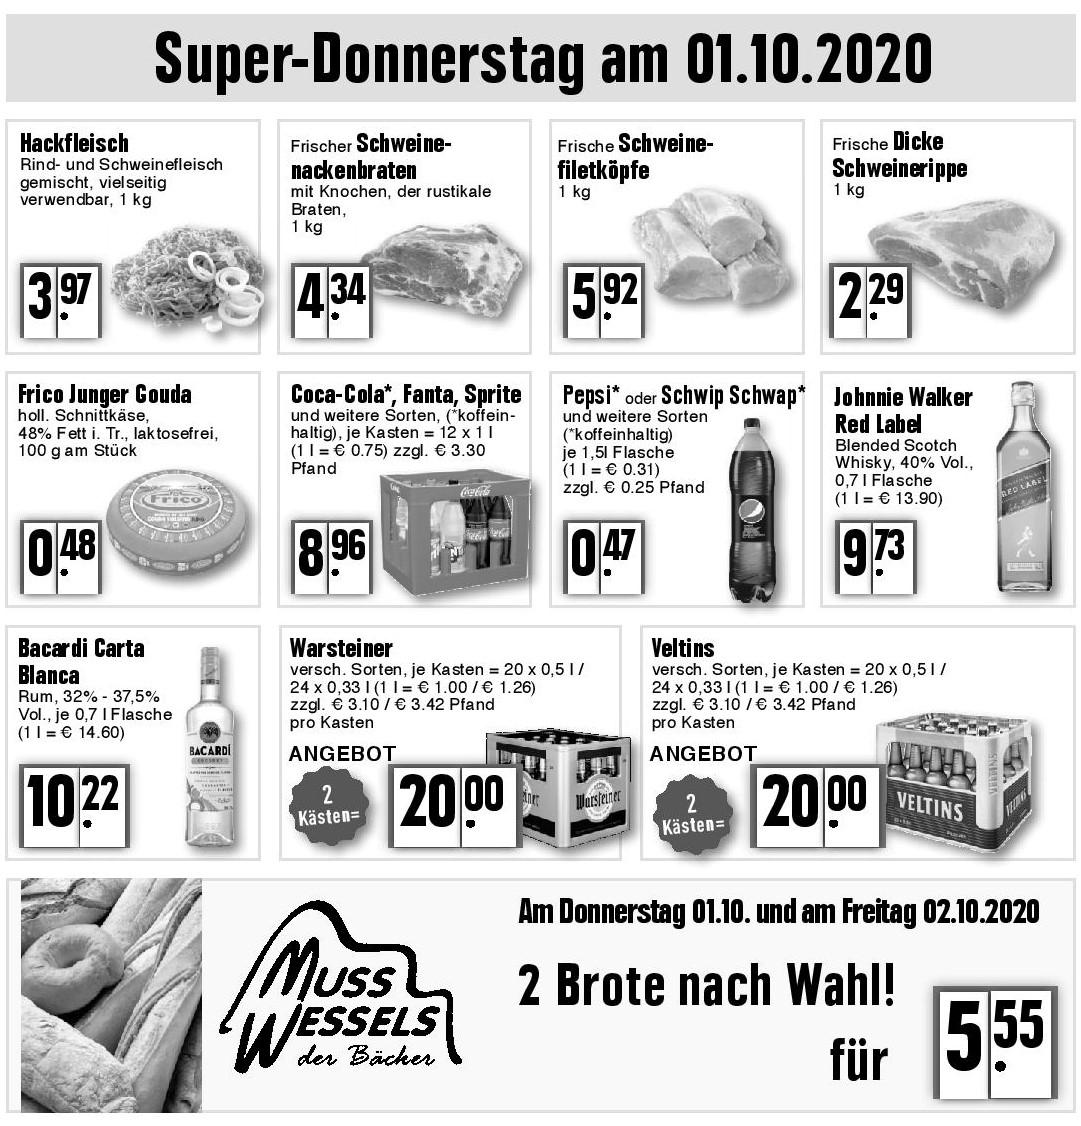 Super-Donnerstag am 01.10.2020